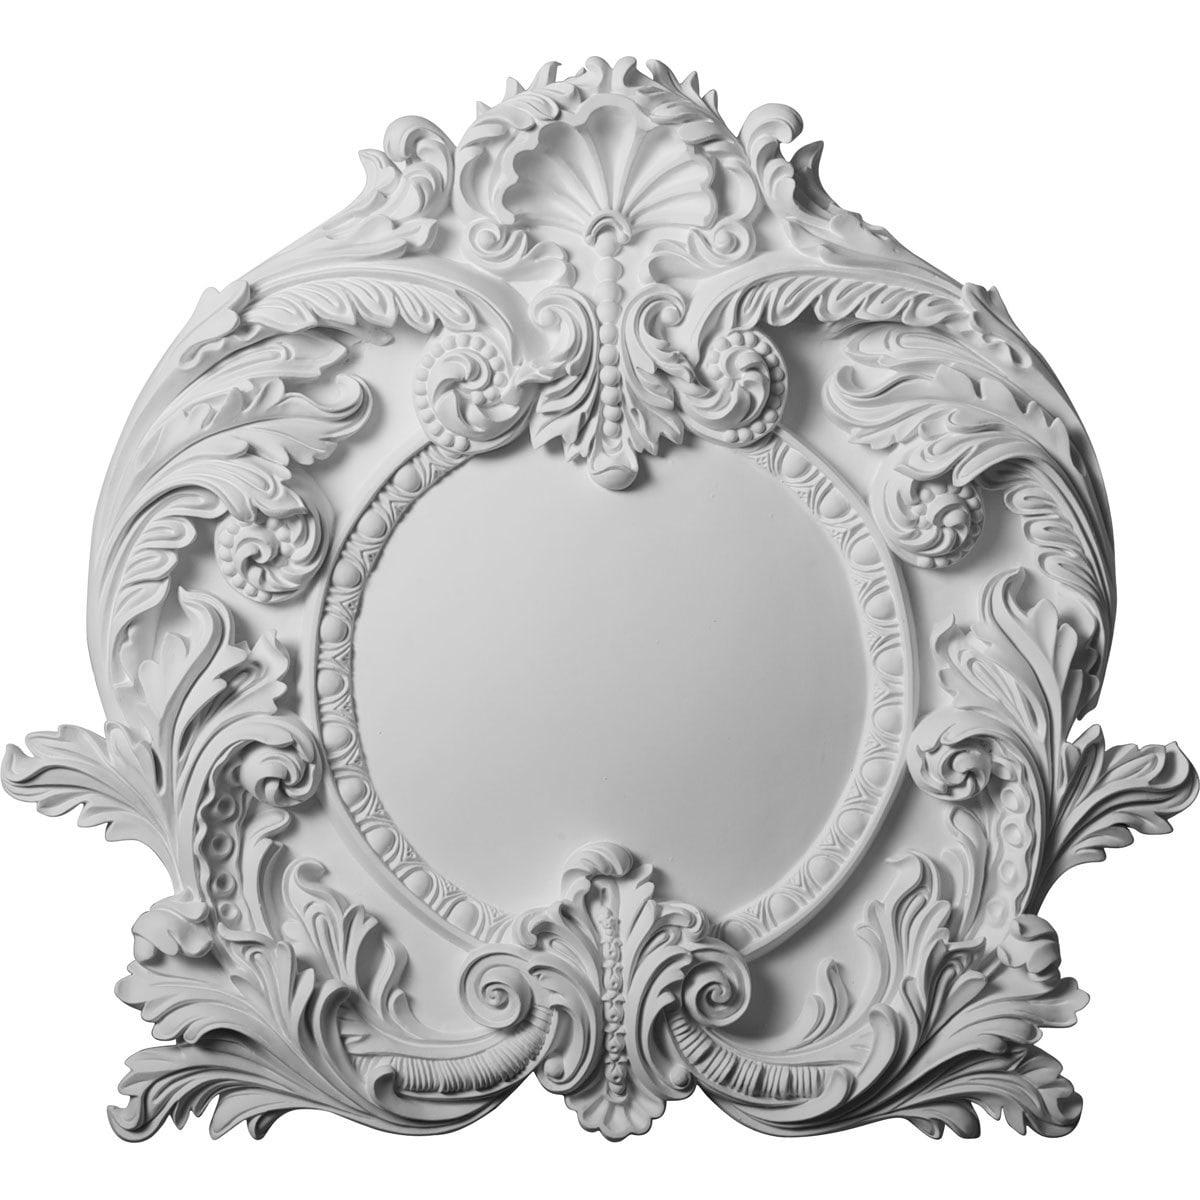 Ekena Millwork - Polyurethane Onlays 150316791